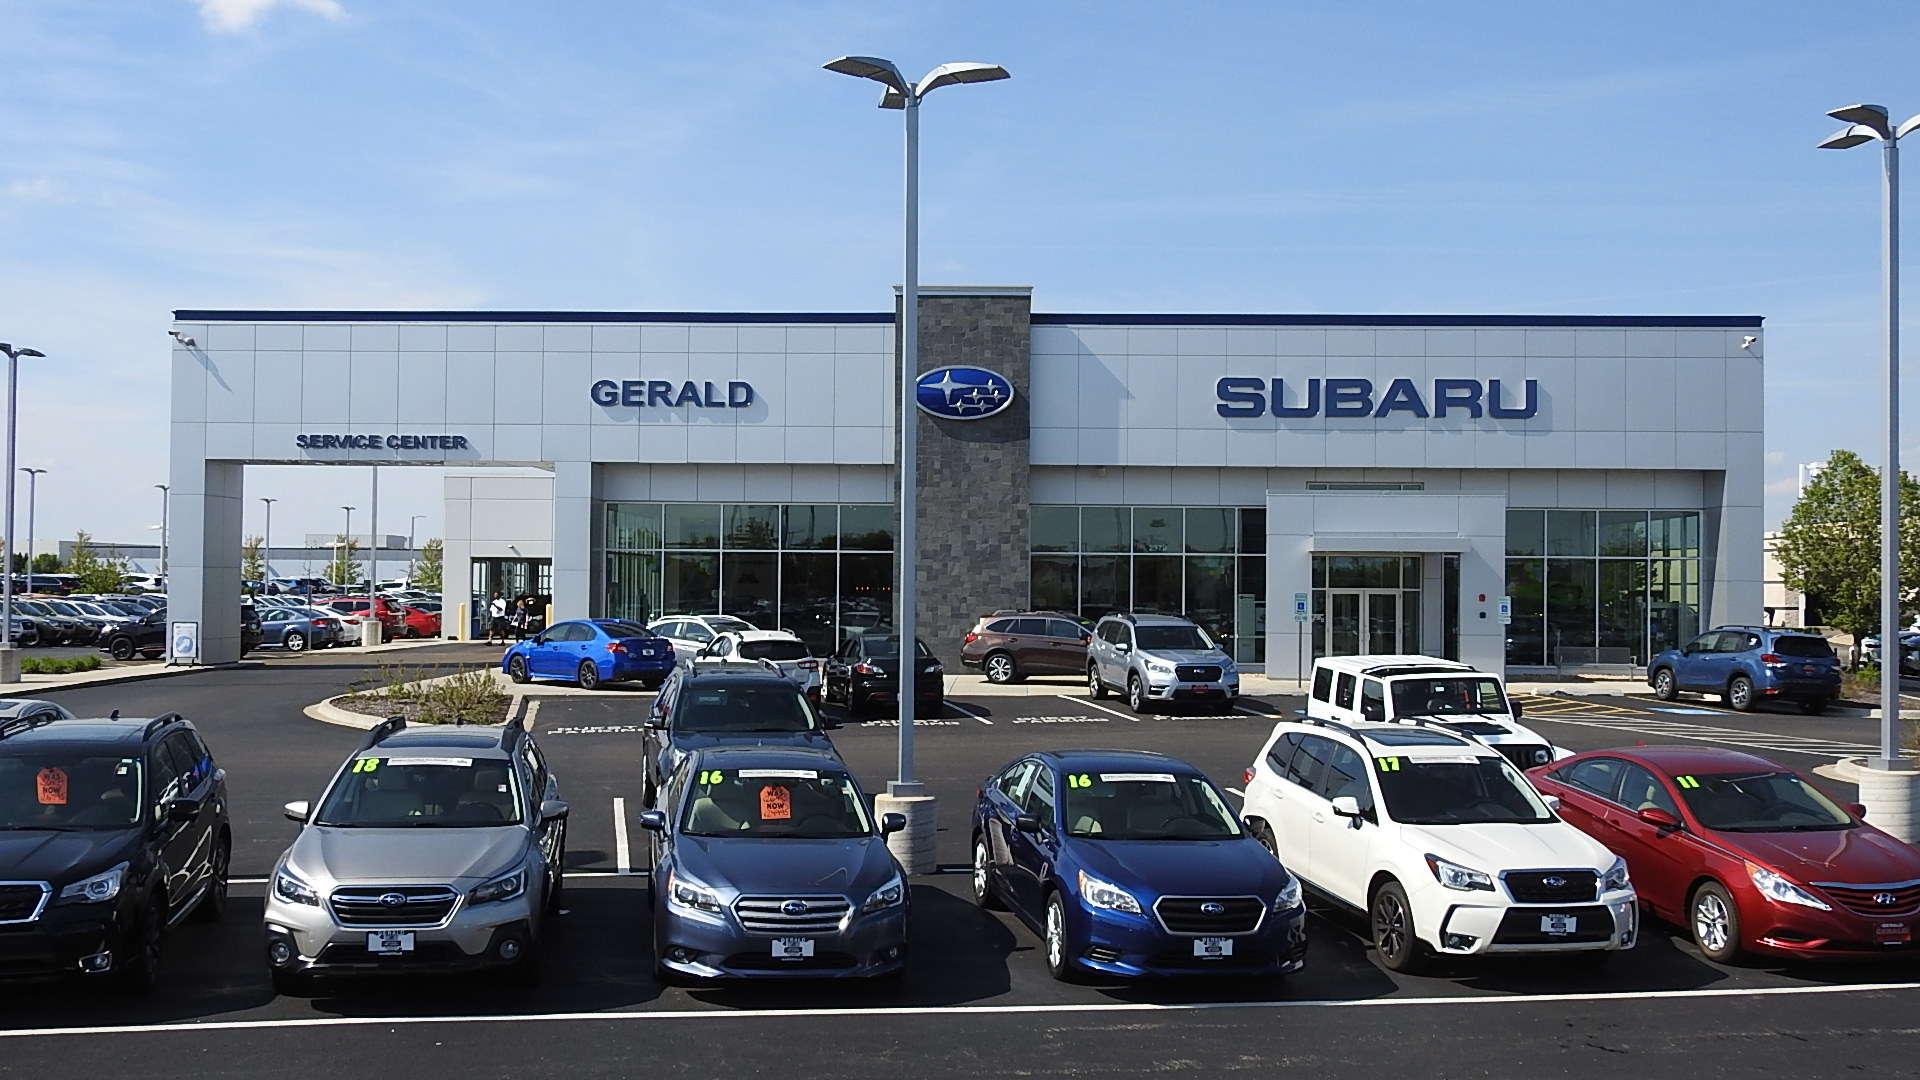 Gerald Subaru of Naperville